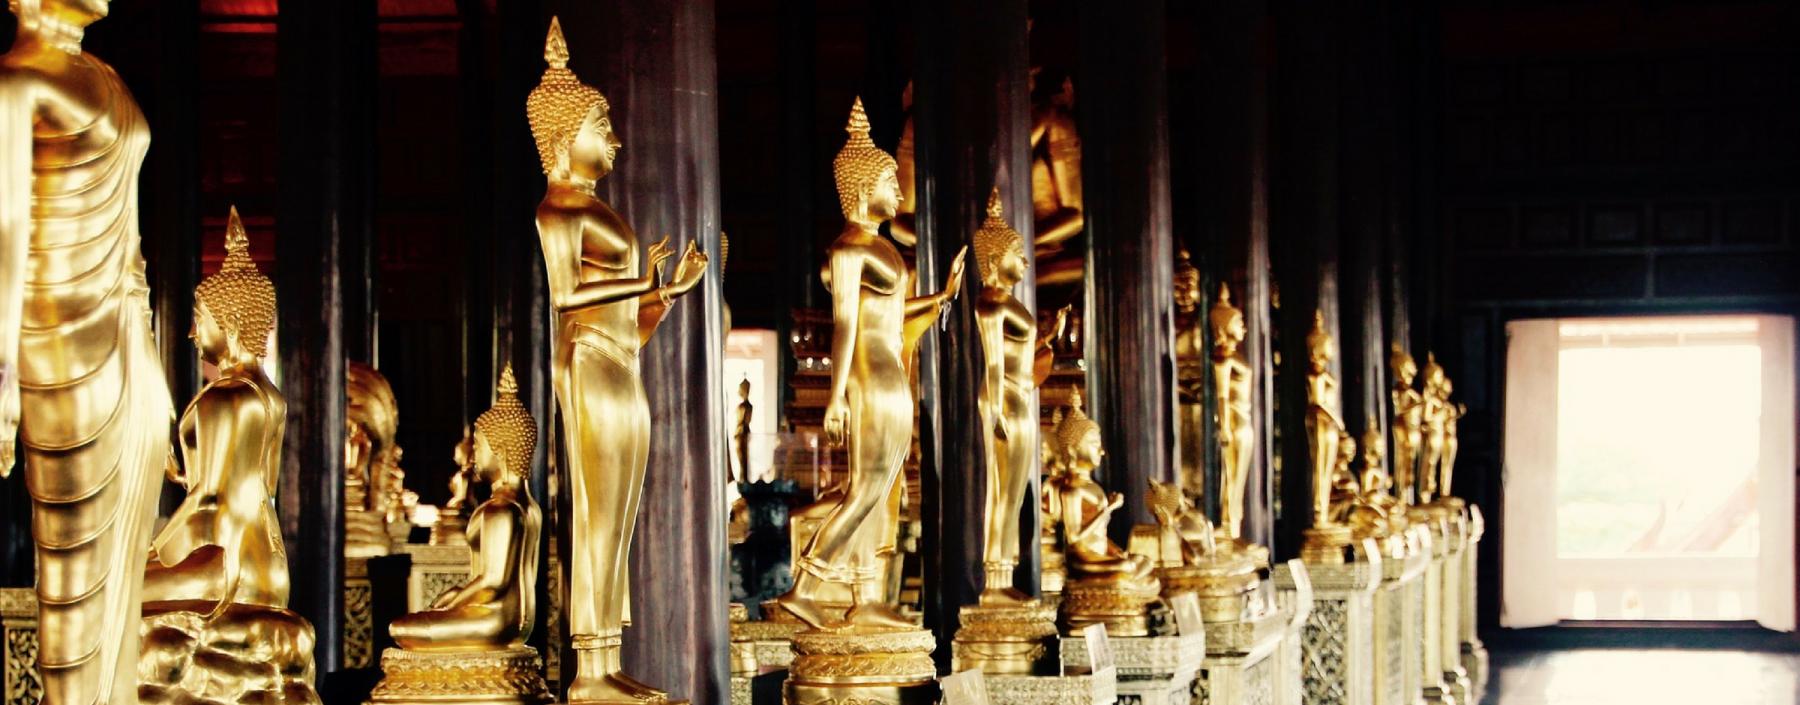 Sofitel Bangkok Sukhumvit - Top 5 temples to visit in Bangkok